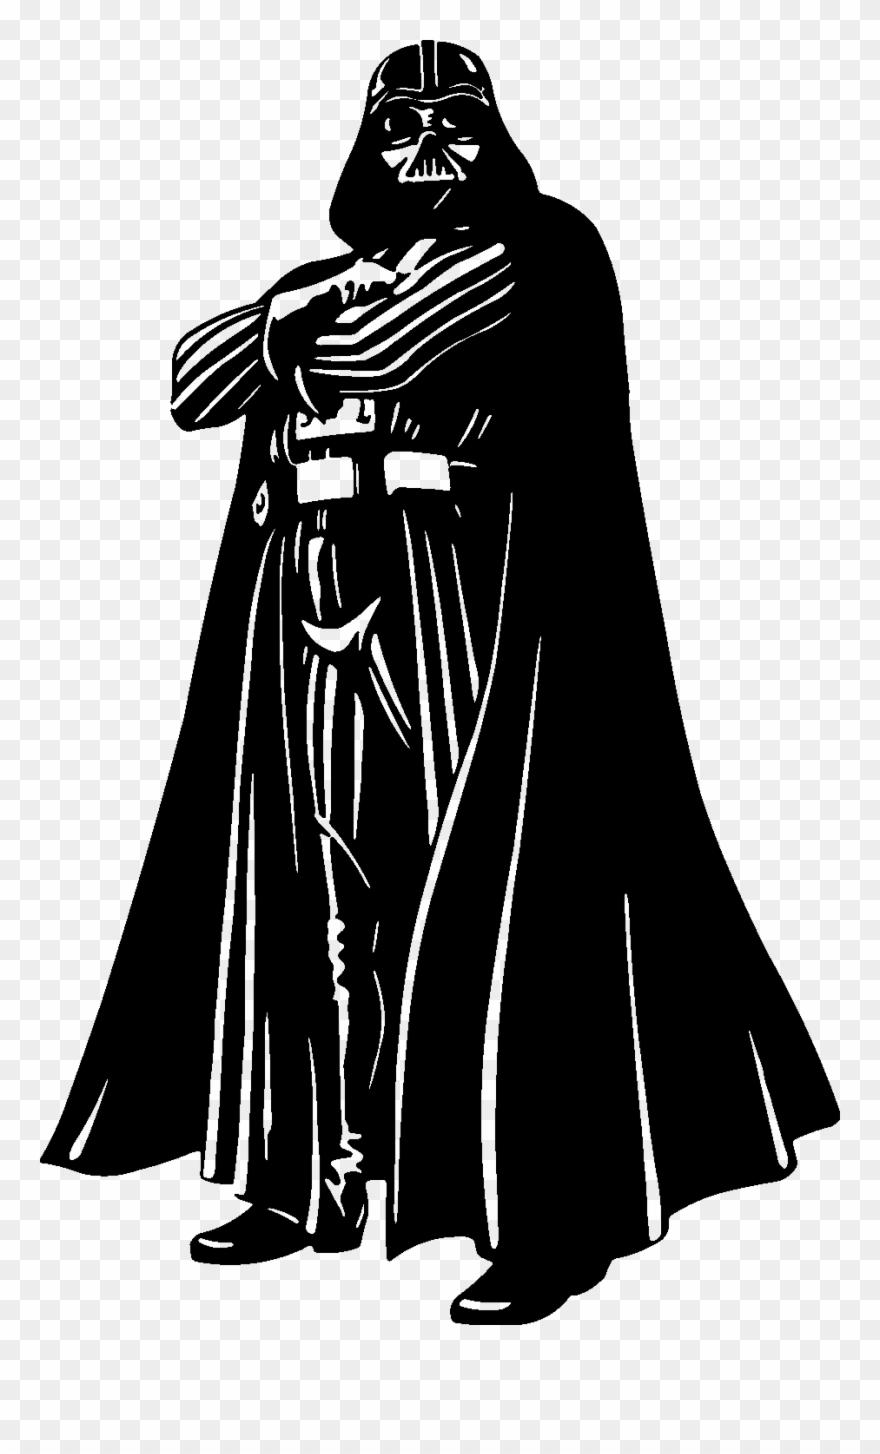 Darth Vader Vector Eps Free Download, Logo, Icons,.